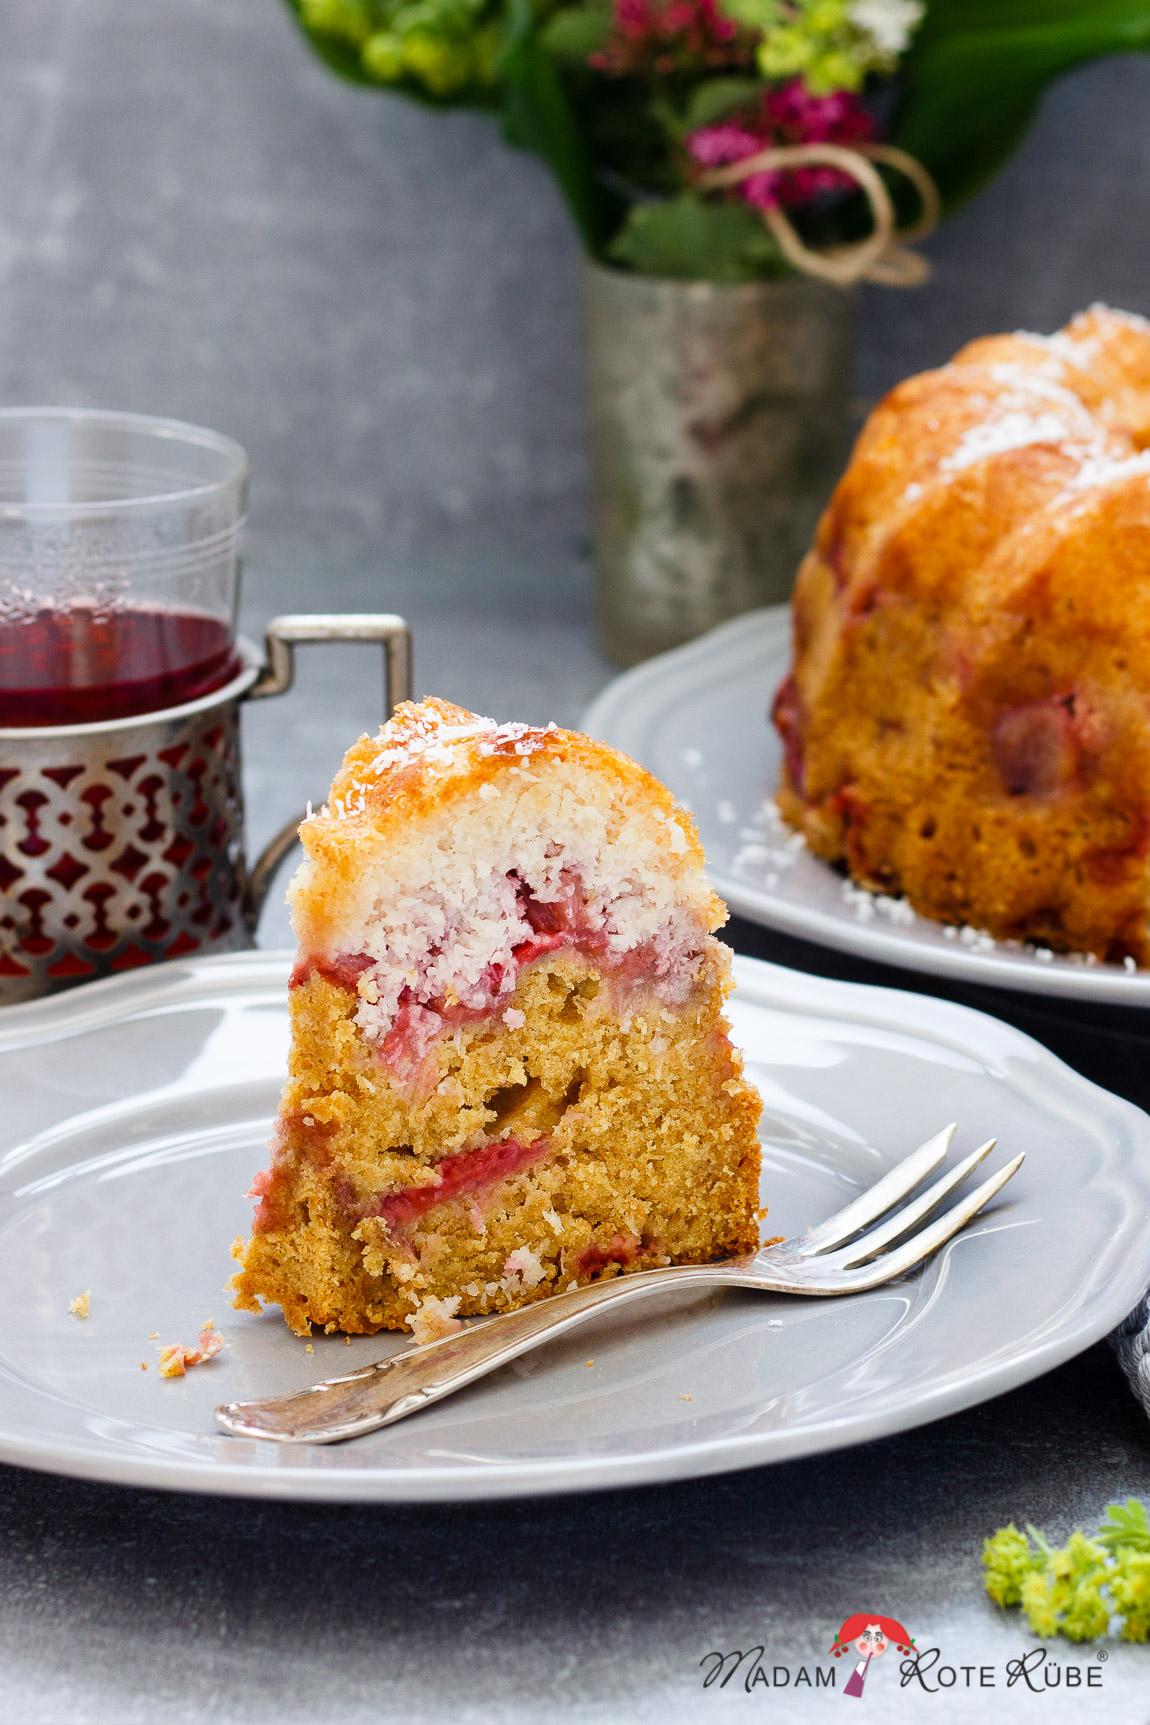 Madam Rote Rübe - Saftiger Erdbeer-Kokos-Gugelhupf mit Dinkelvollkorn